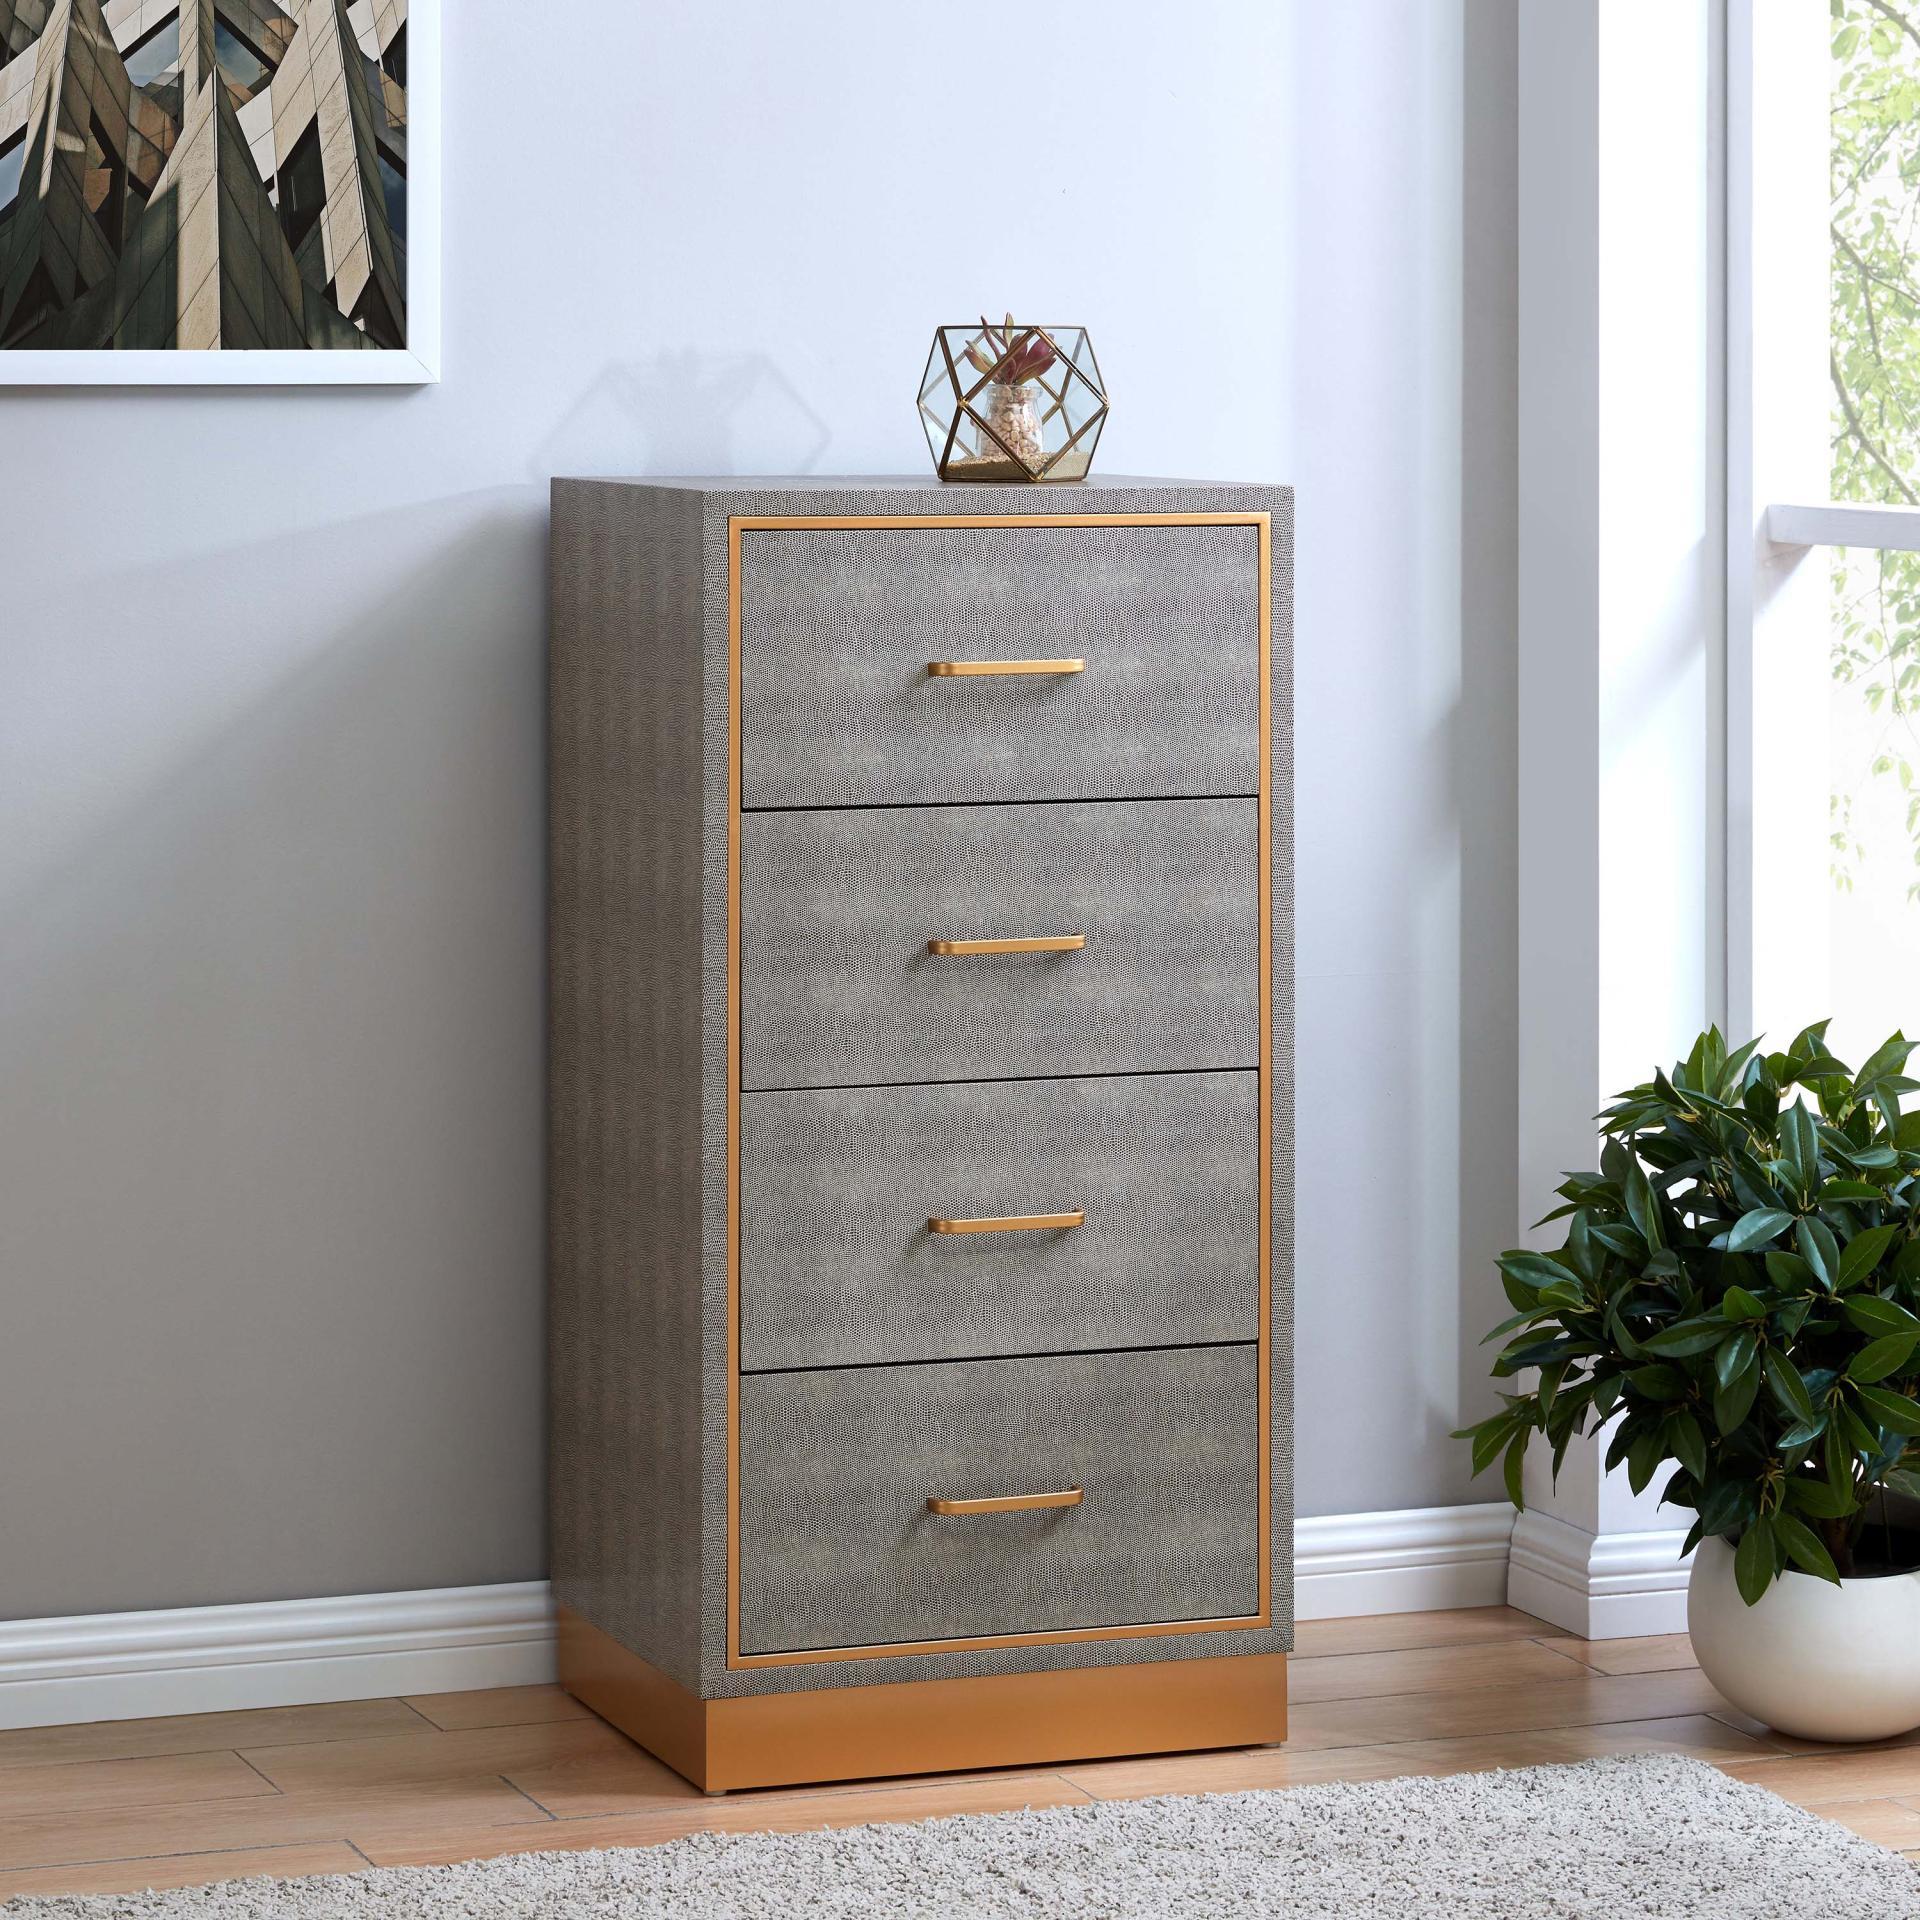 1600048 Npd Home Furniture Wholesale Lifestyle